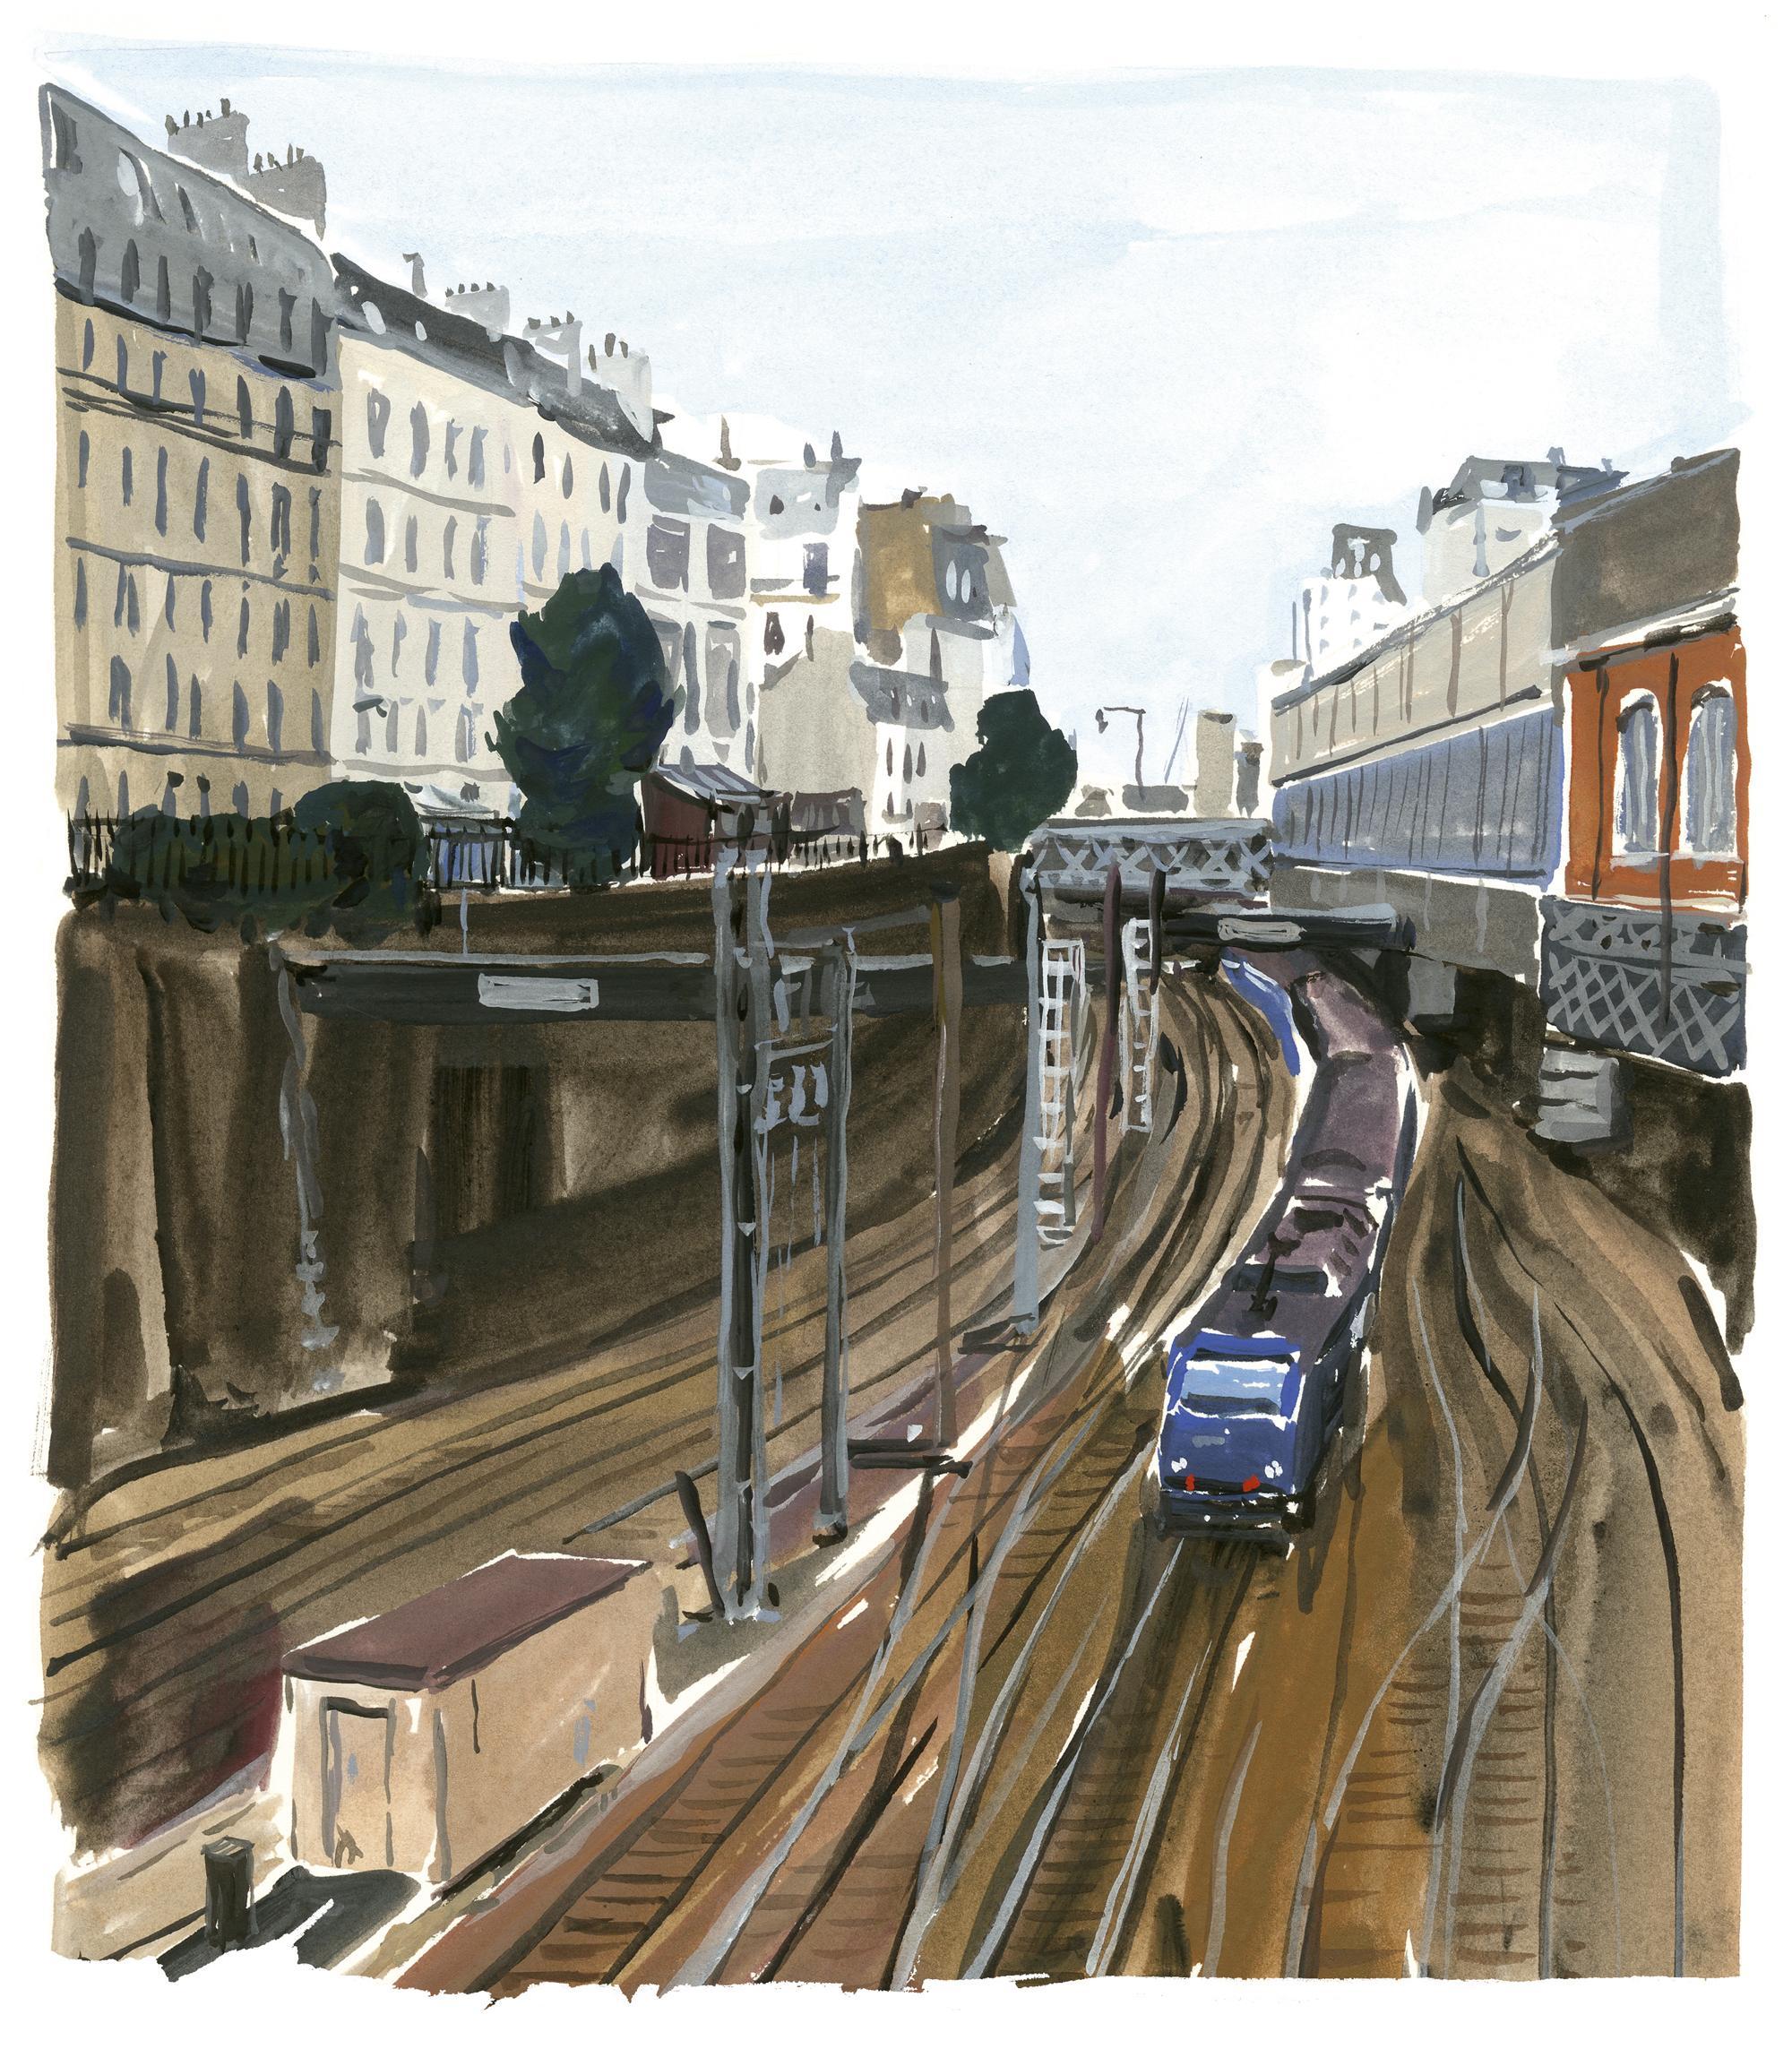 Pariser Tagebuch: Die Eisenbahn